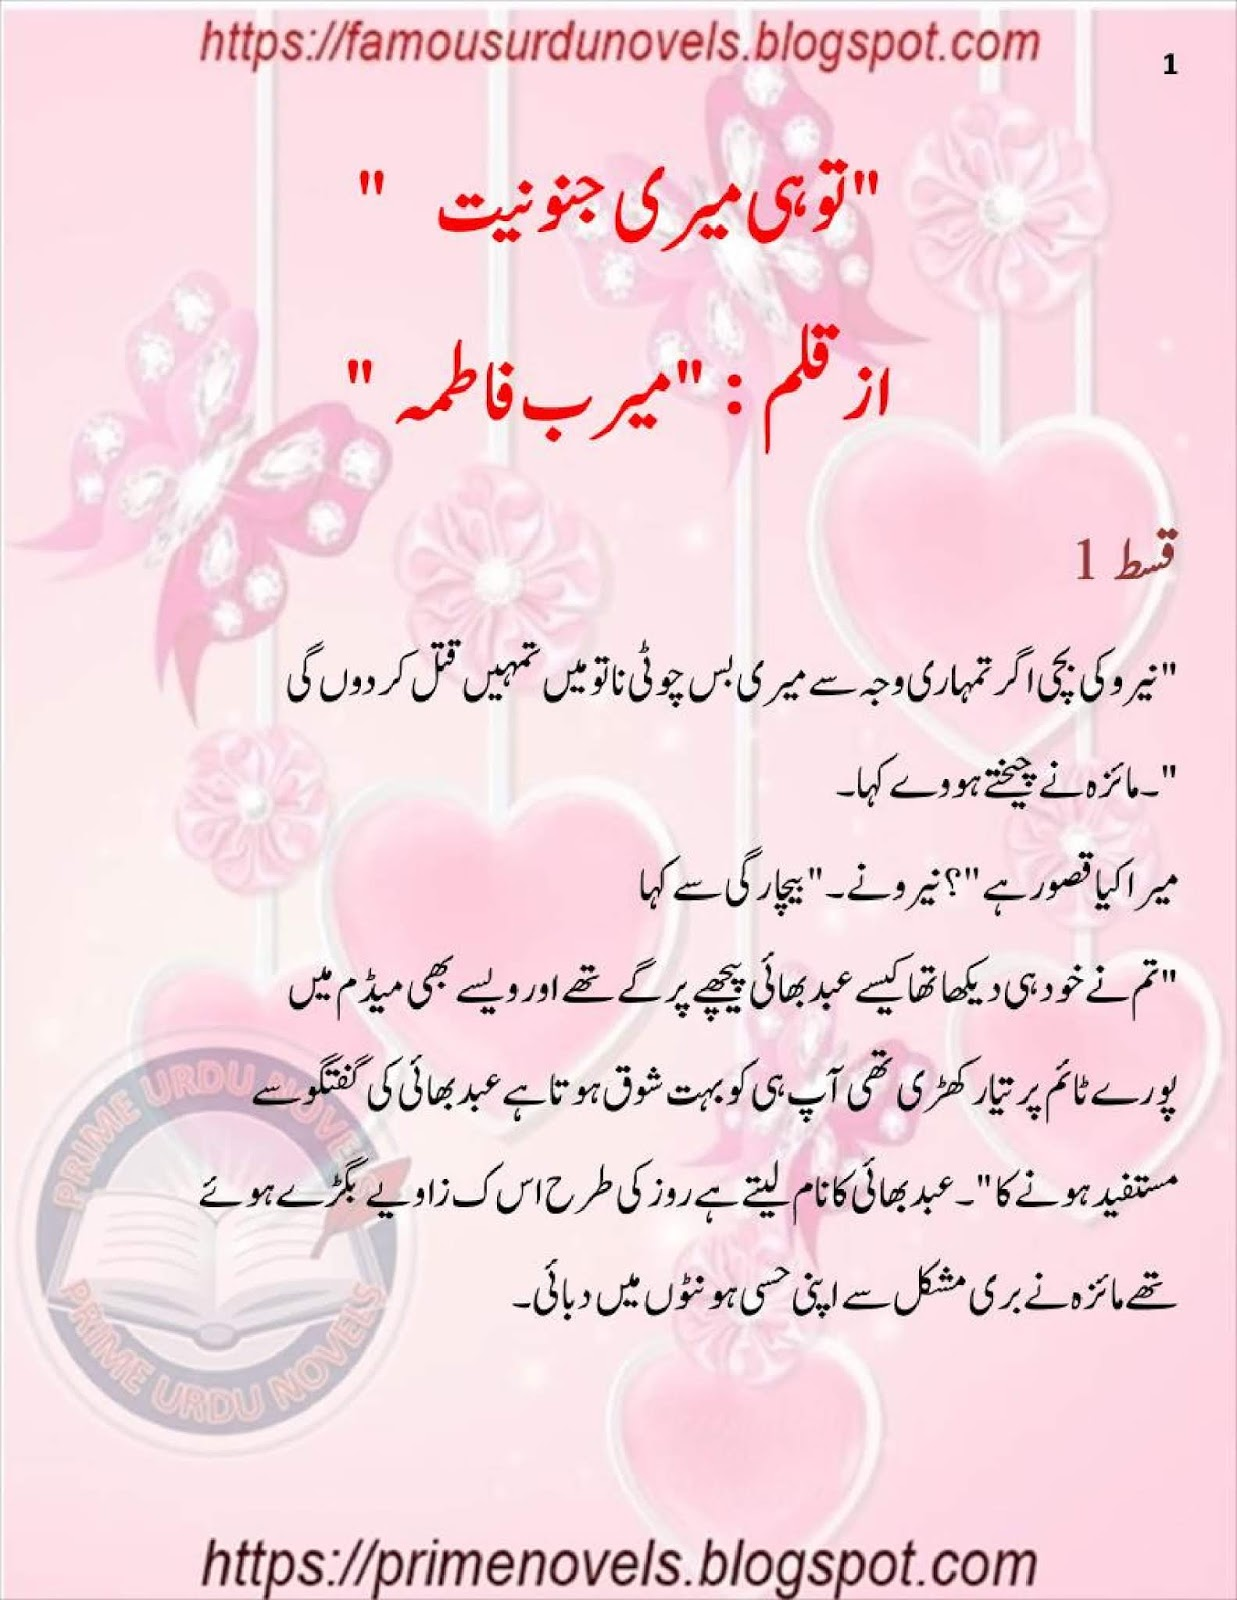 Tu He Meri Junooniyat Novel By Meerab Fatima Kidnapping